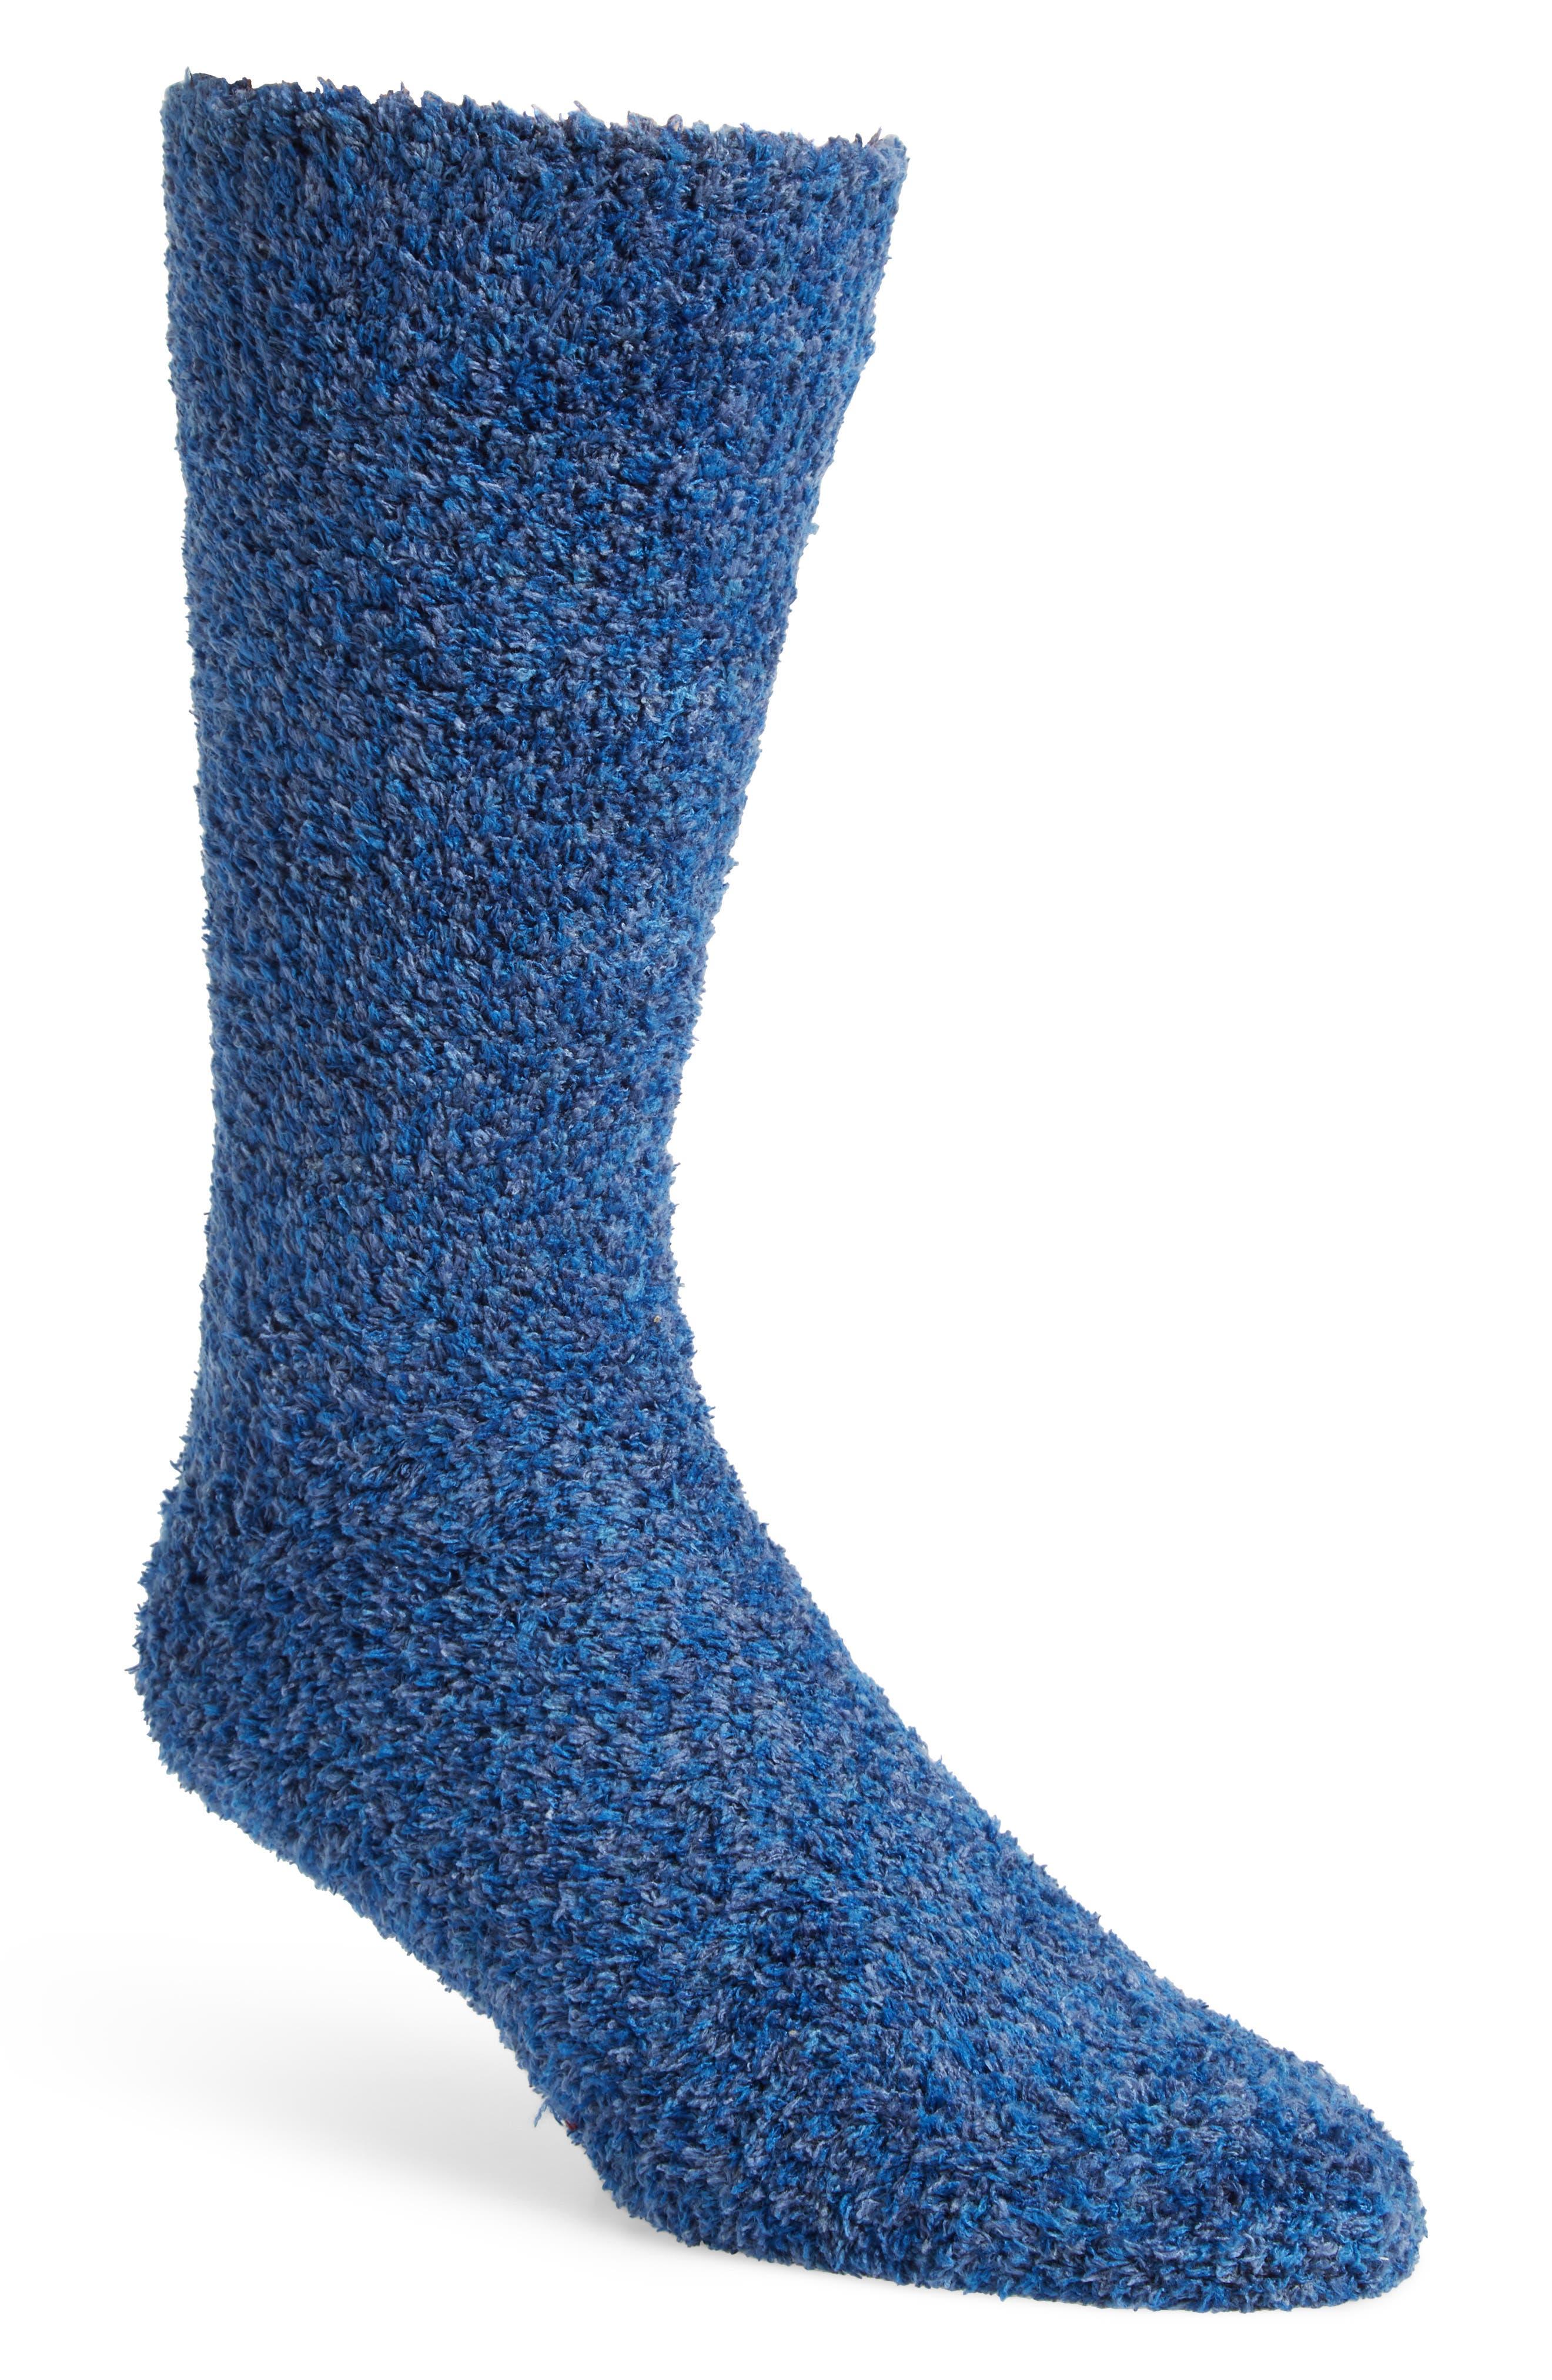 Marled Butter Socks,                         Main,                         color, NAVY/ BLUE